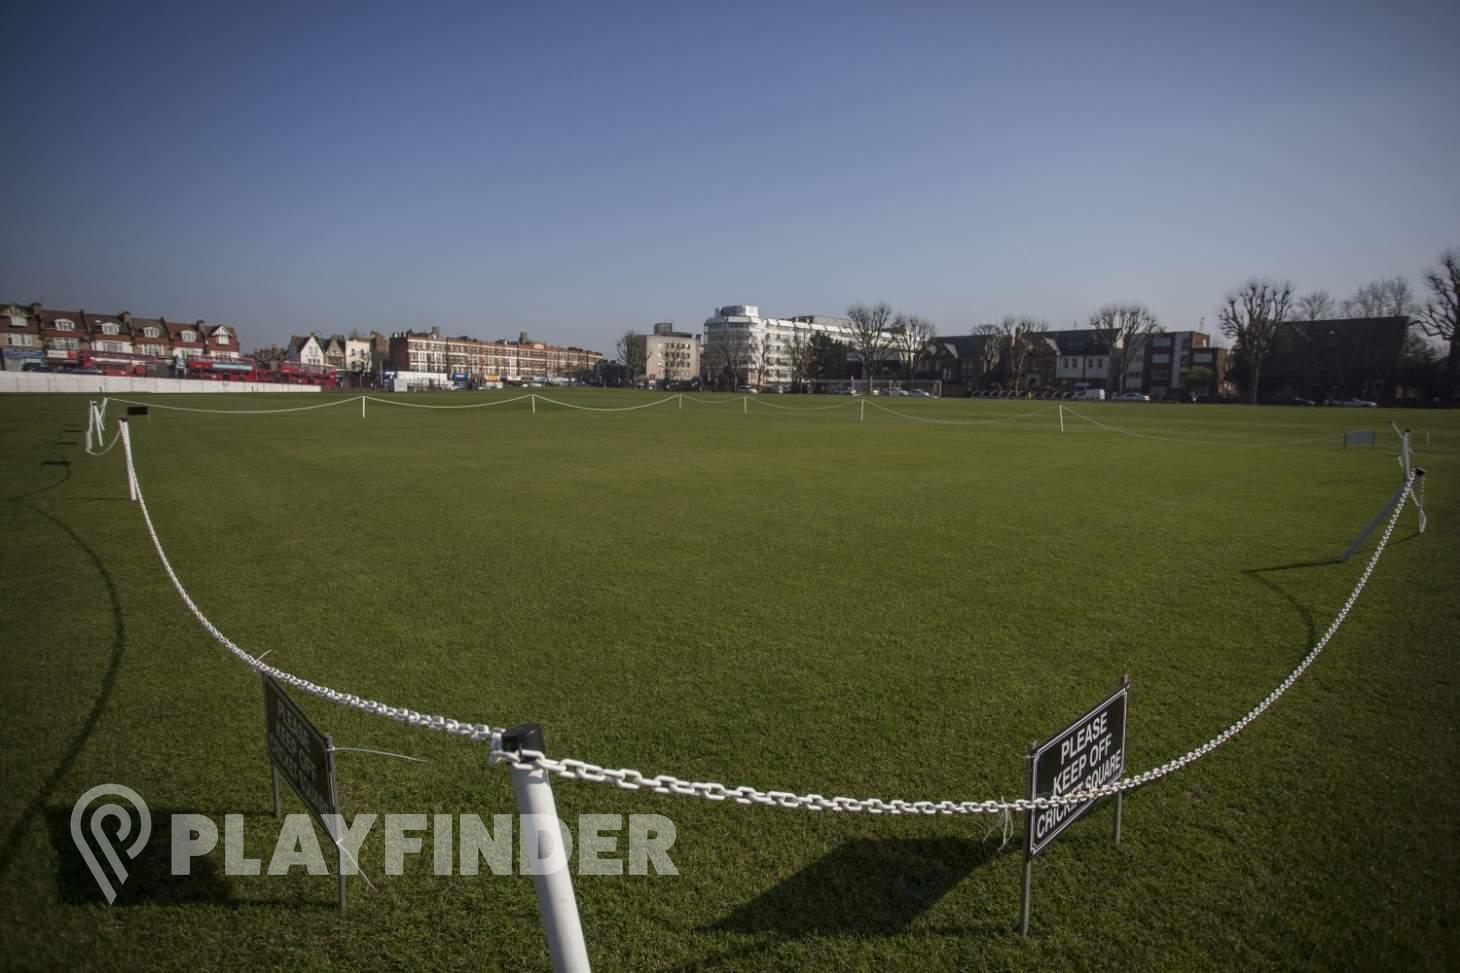 Jubilee Sports Ground (St Dunstan's Enterprises) Full size | Grass cricket facilities